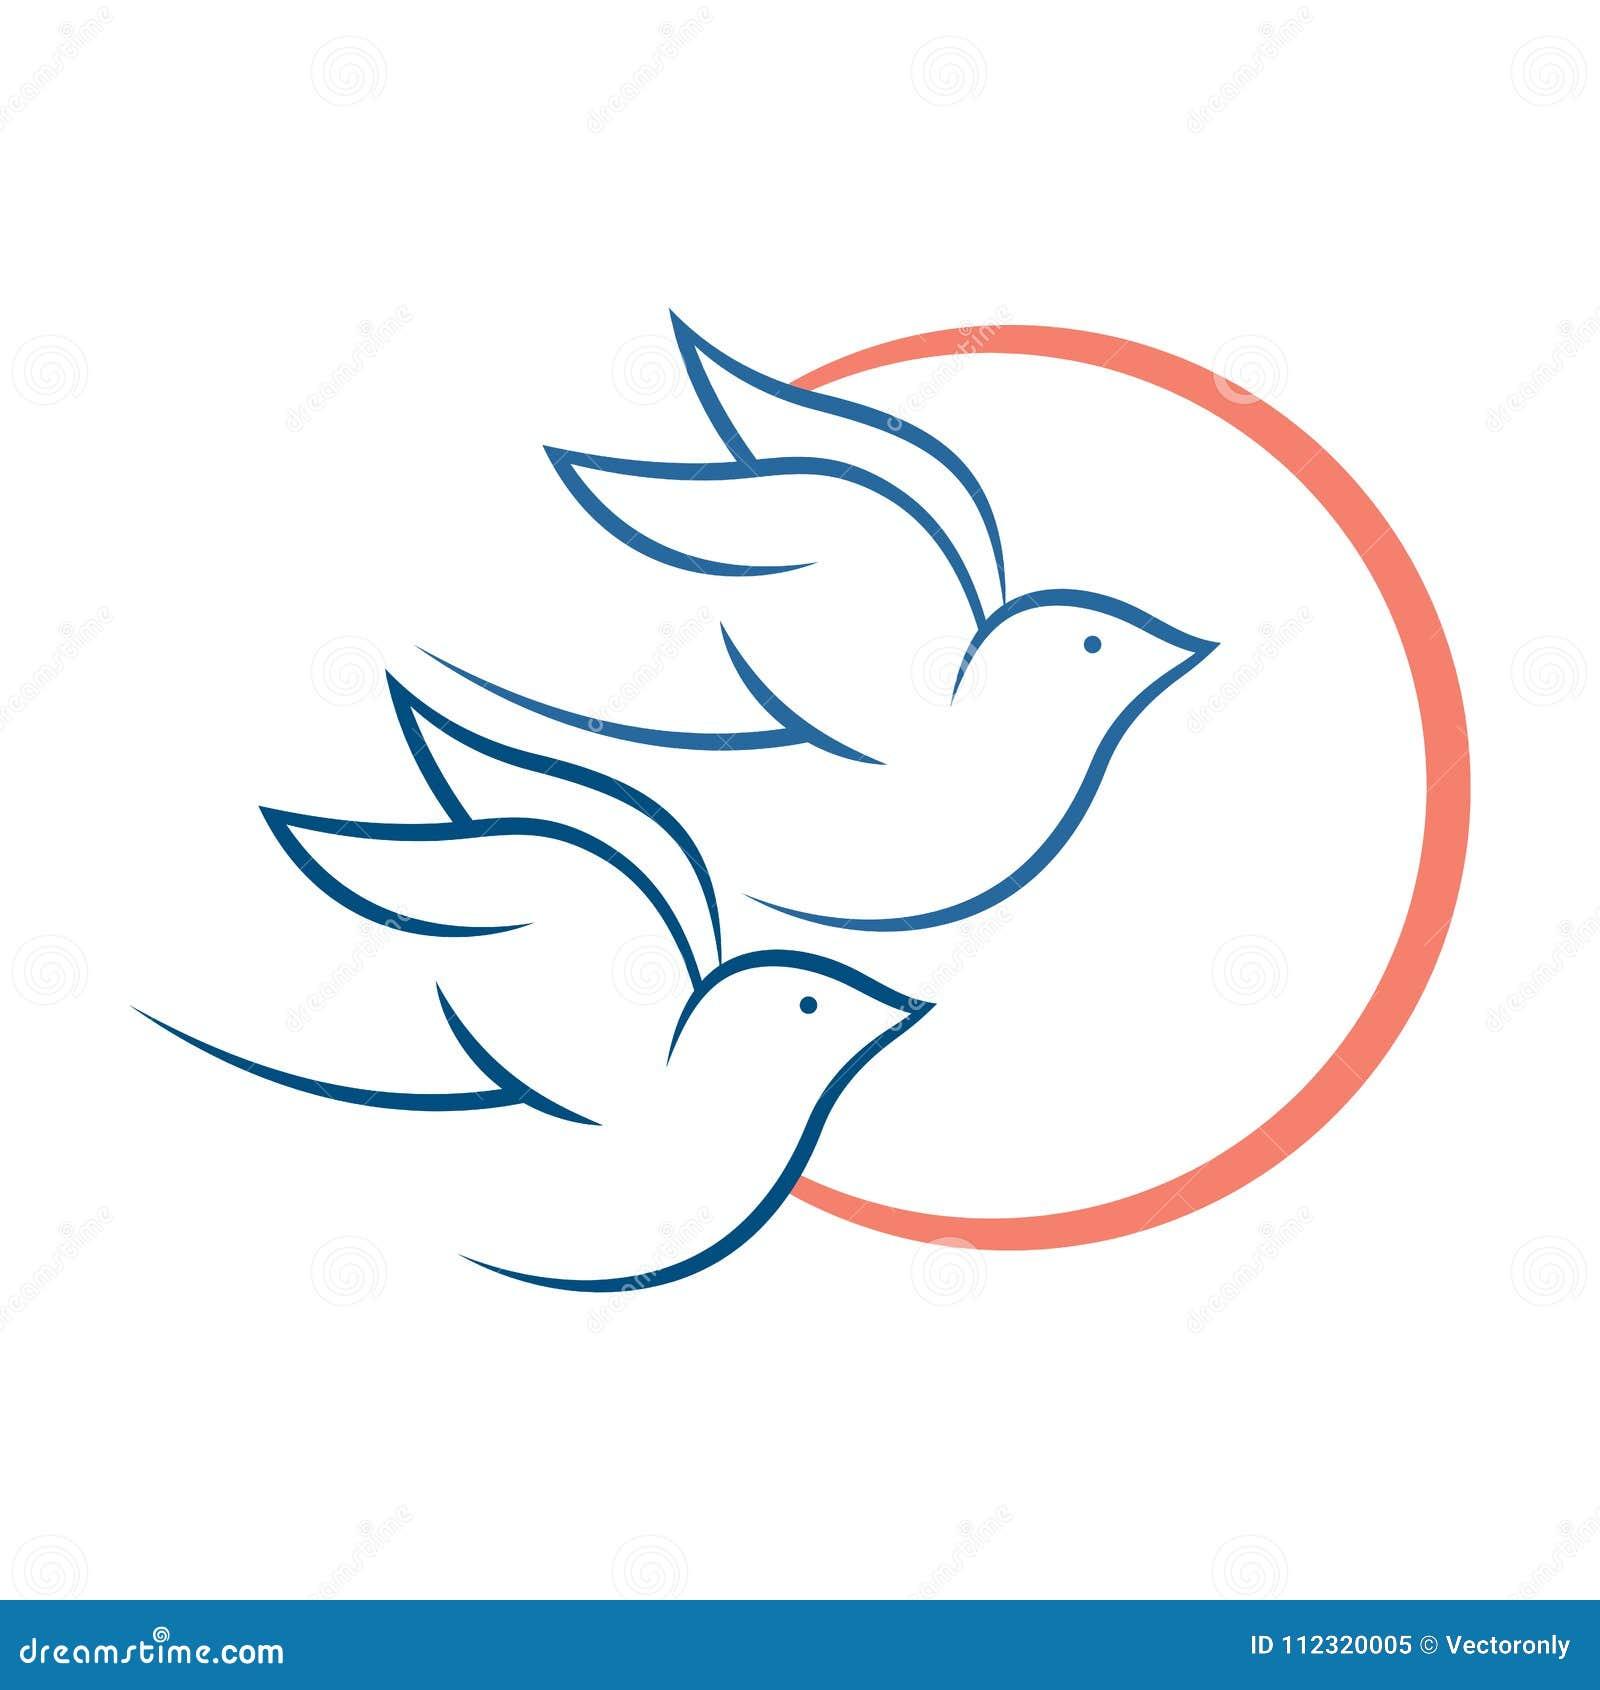 Love Birds Flying Suitable For Logo Stock Vector Illustration Of White Simple 112320005